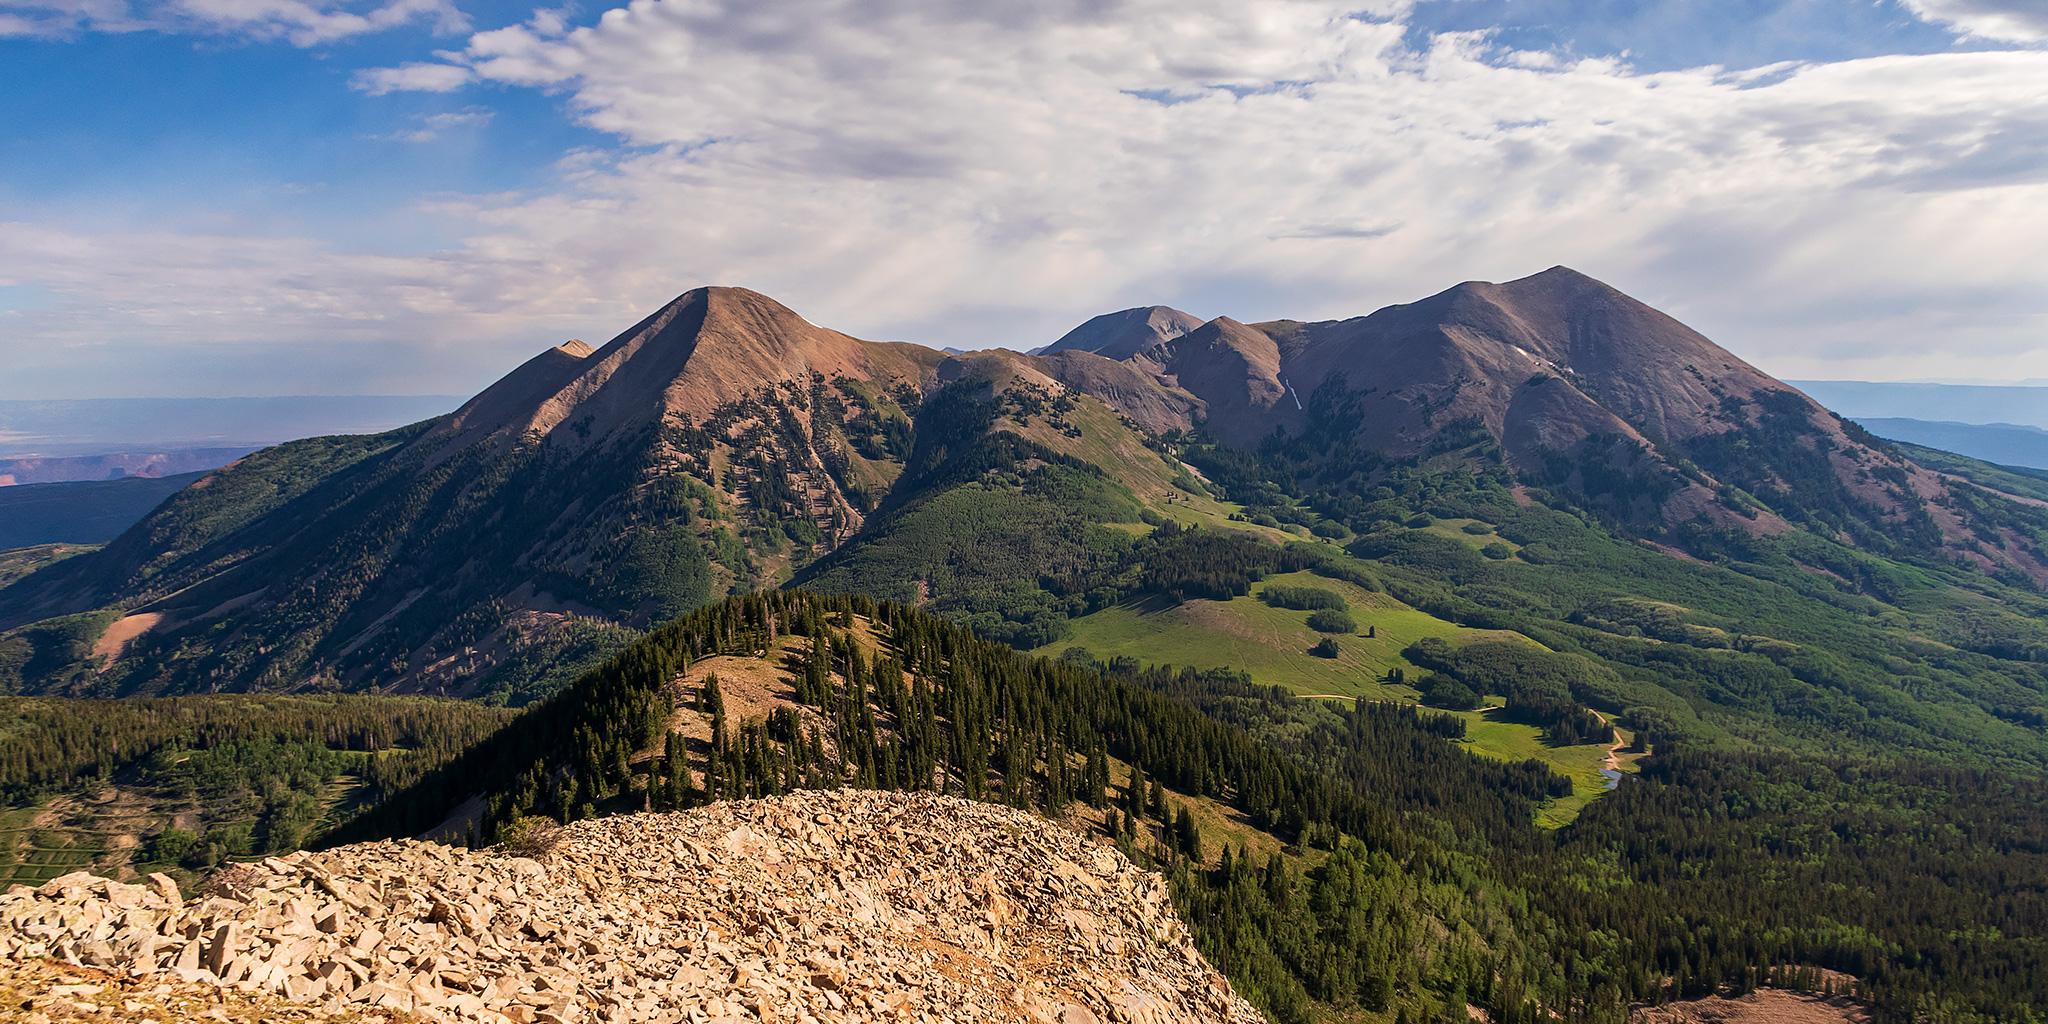 Middle La Sal Peak: Mount Mellenthin